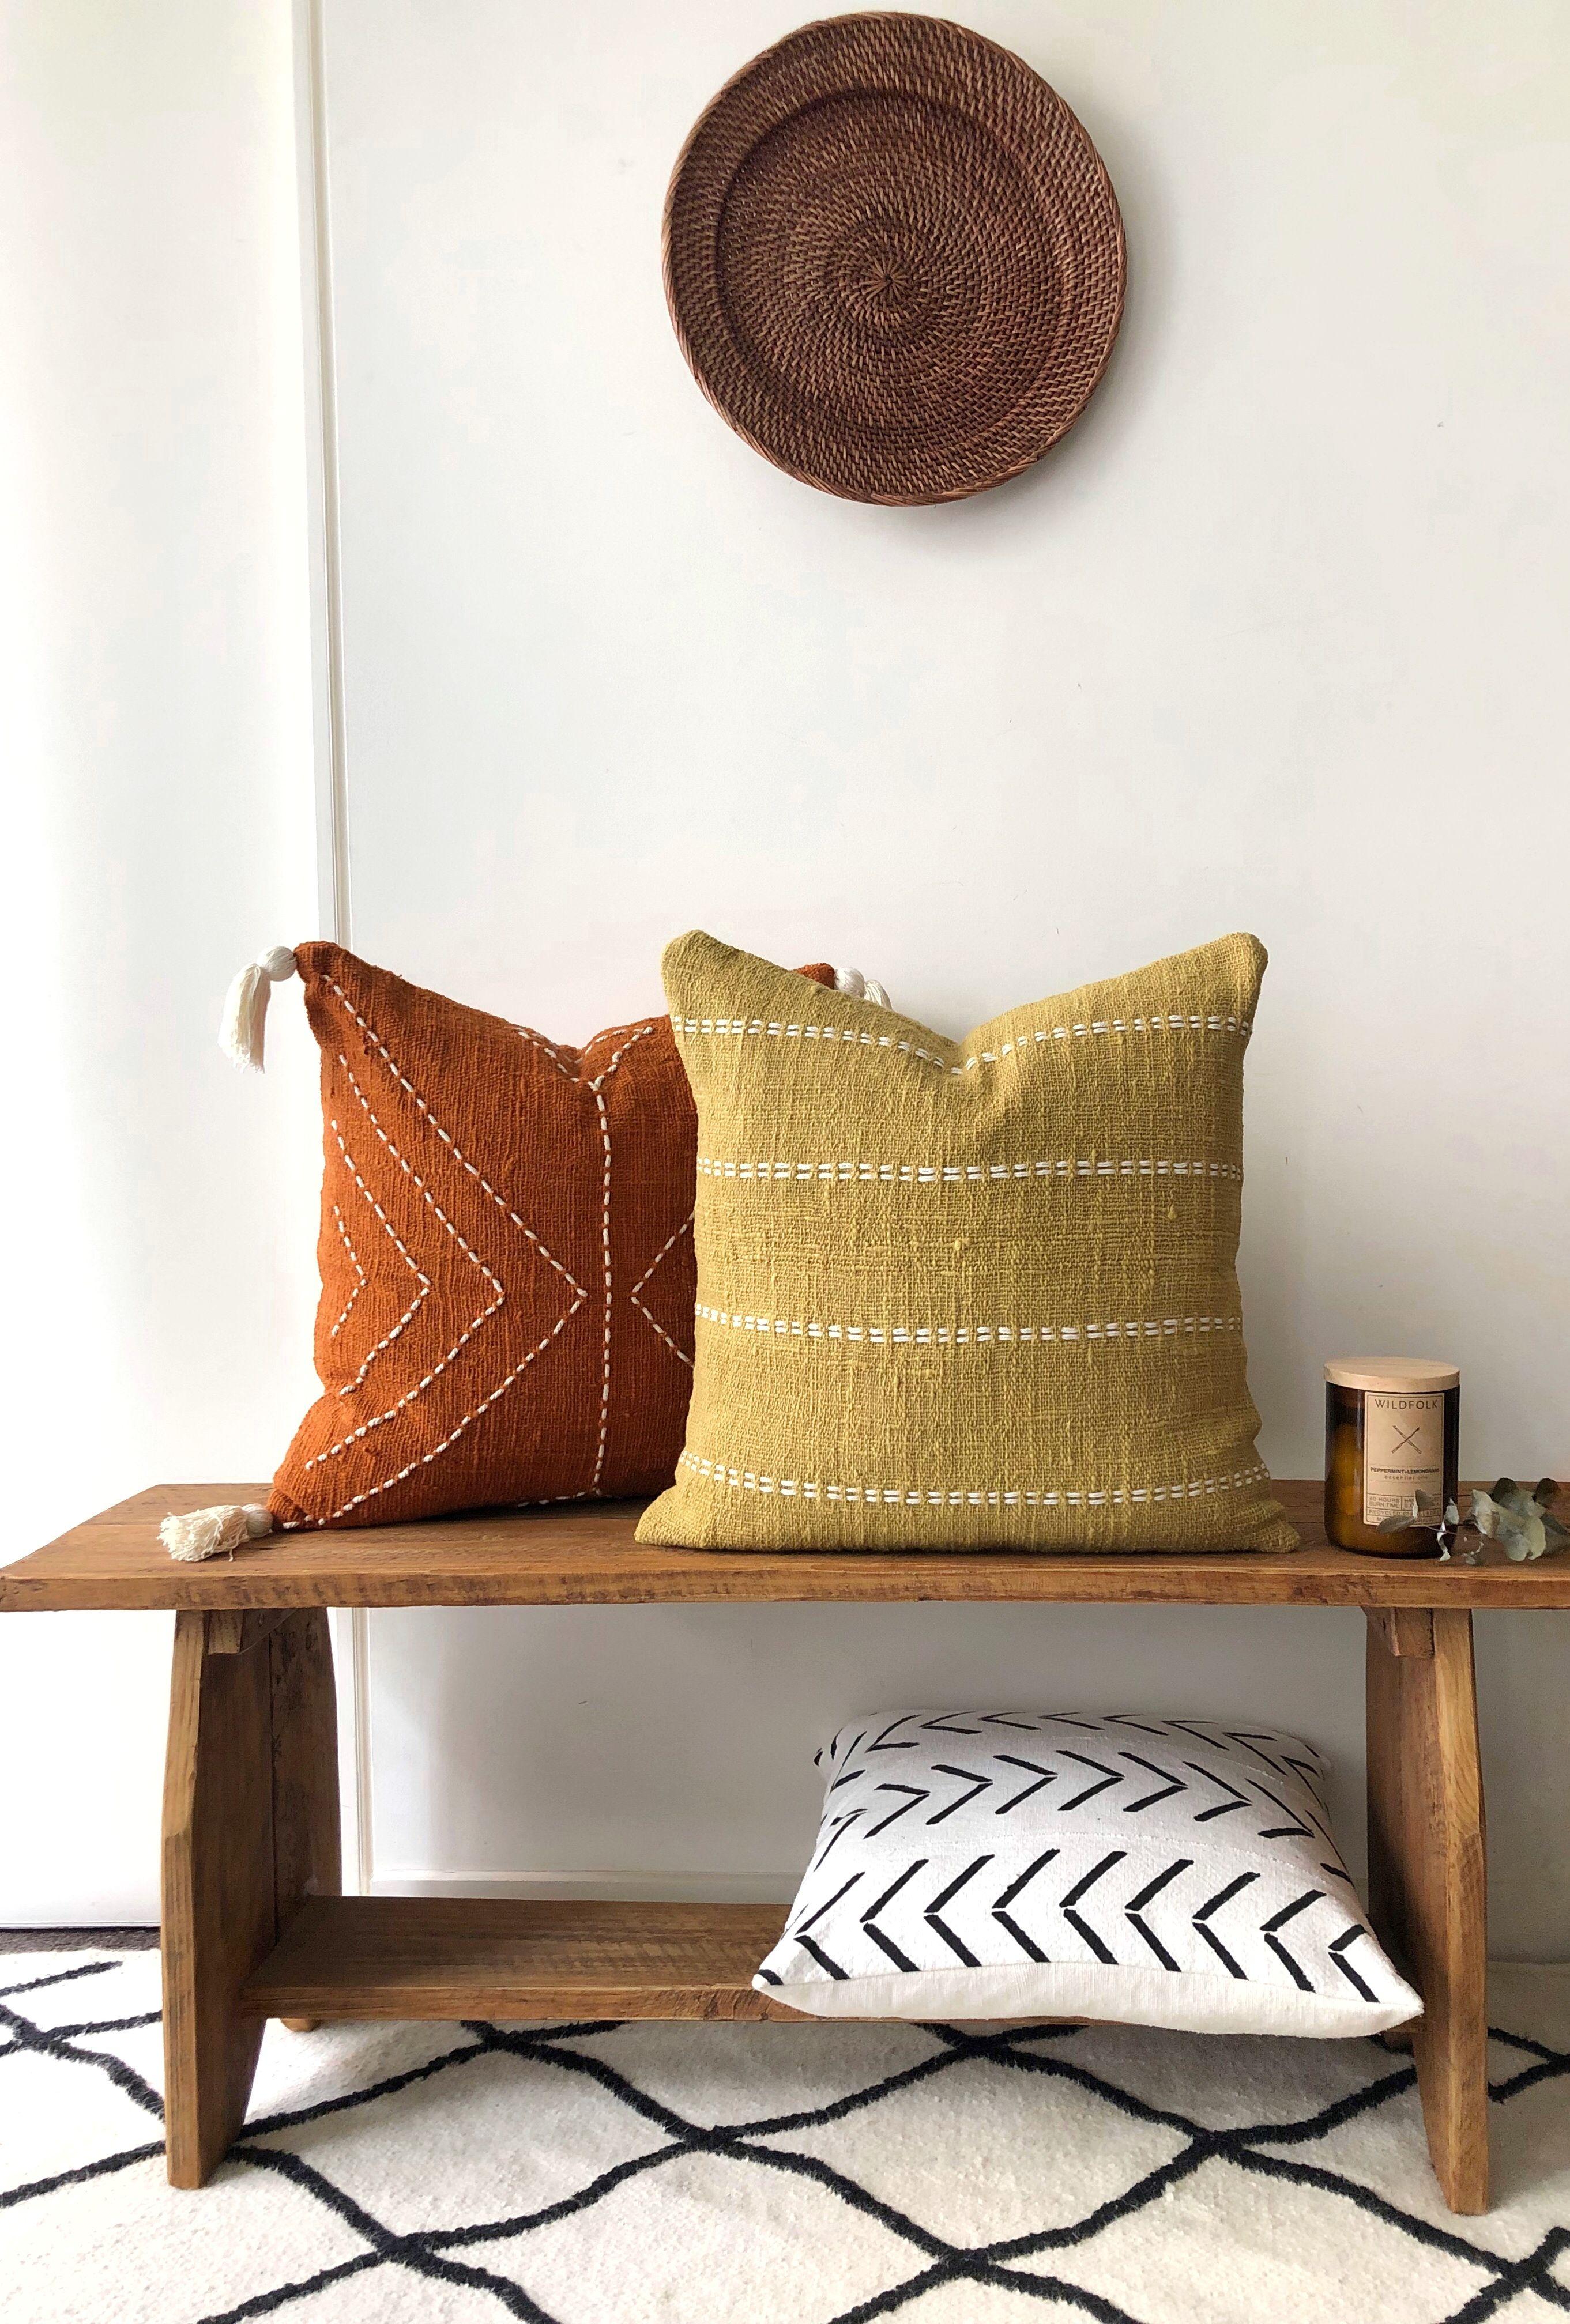 "Mustard Boho Pillow. Organic Natural Raw Cotton Hand-dyed mustard colour with stitch finish. 50x50 (20"") Australia cushions. Home Decor"